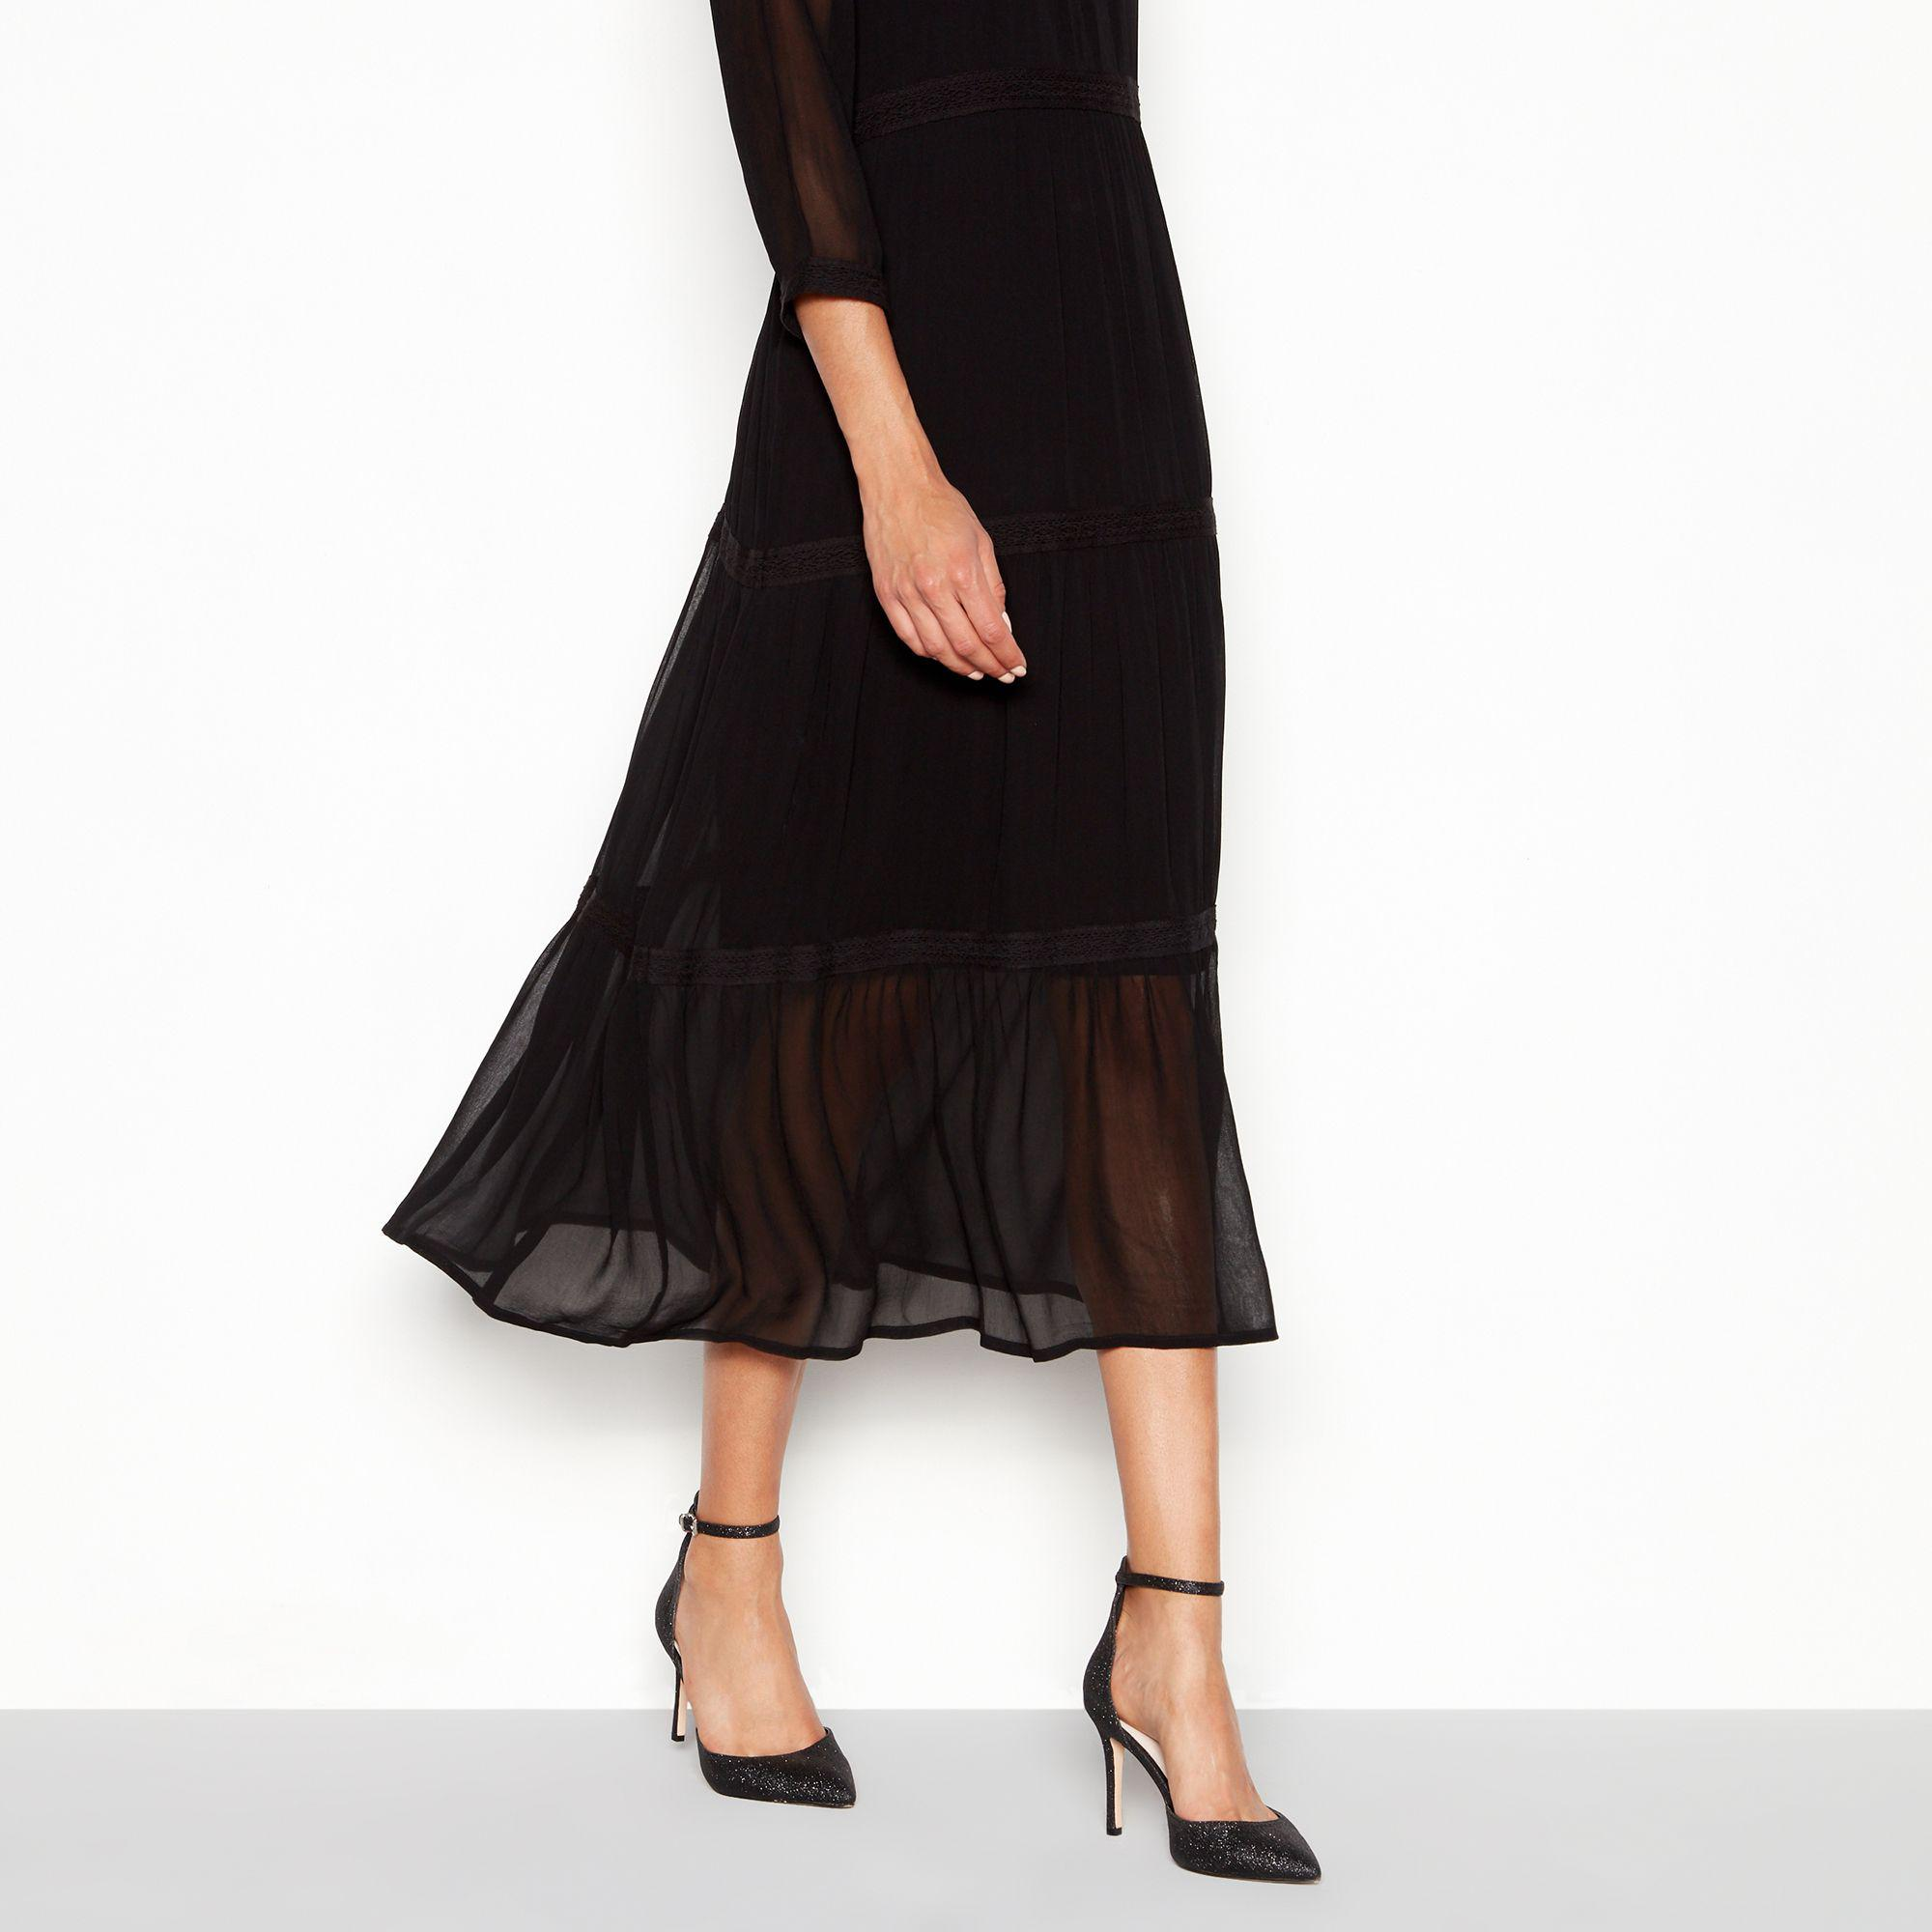 95e3b4648b7b Faith Black Glitter  witter  High Stiletto Heel Wide Fit Pointed ...